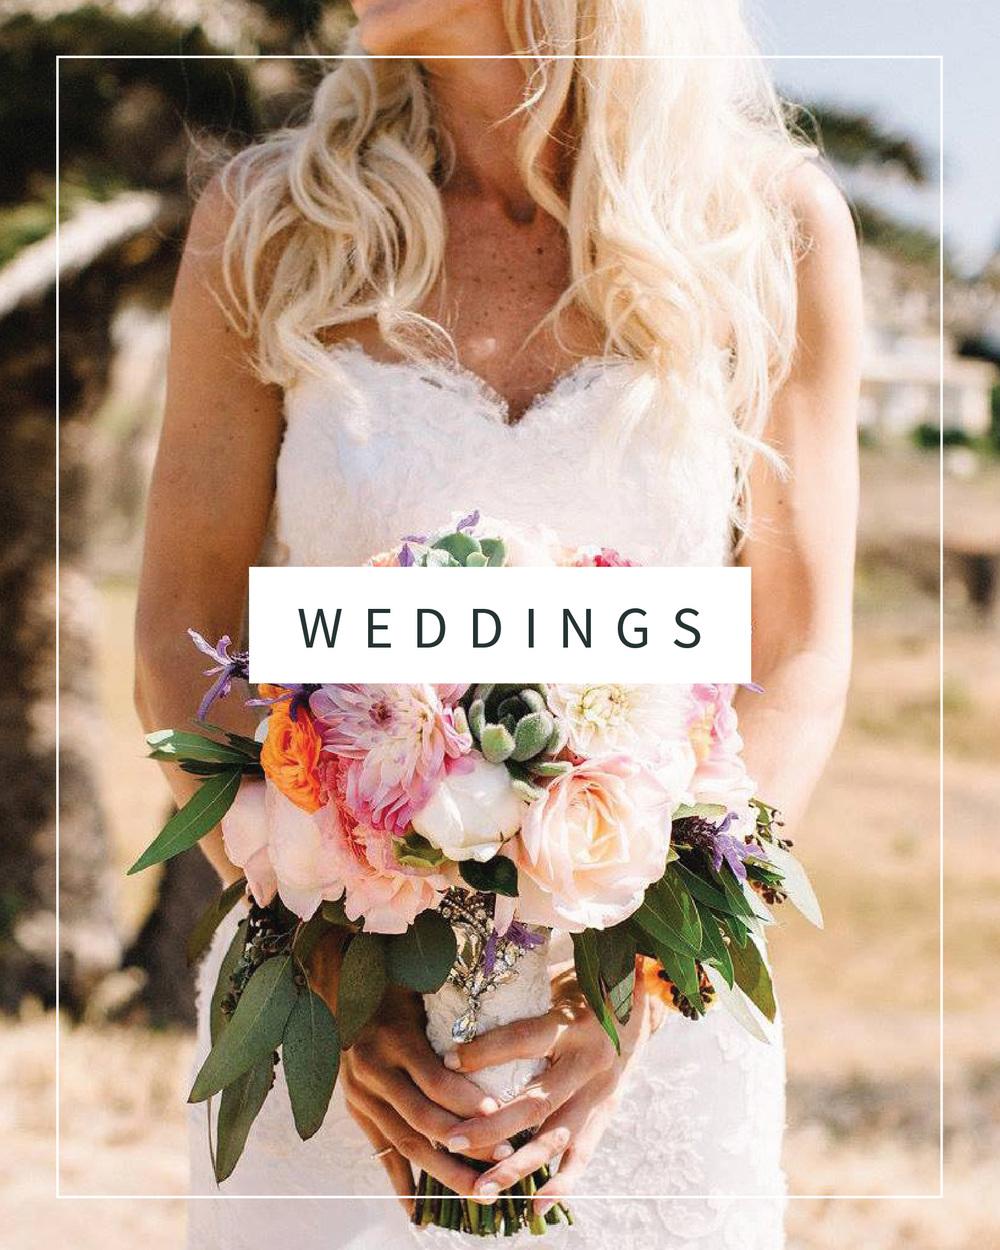 WEDDING thumbnail.jpg